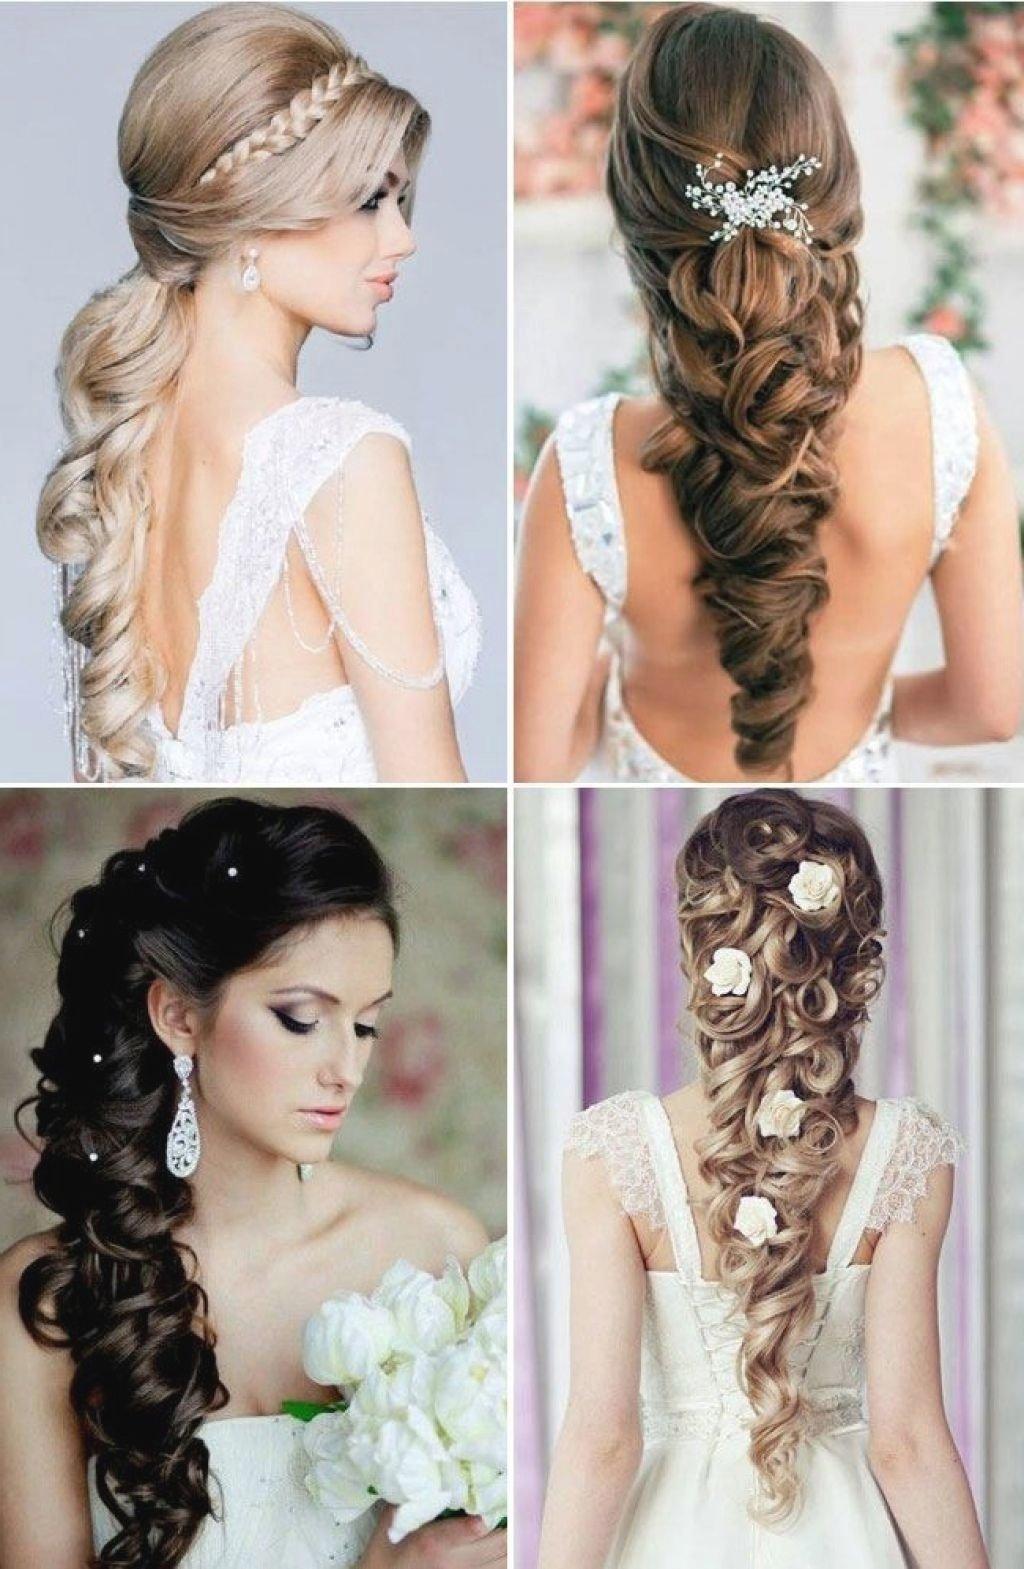 Galeria de fotos de casamento cabelo longo updo